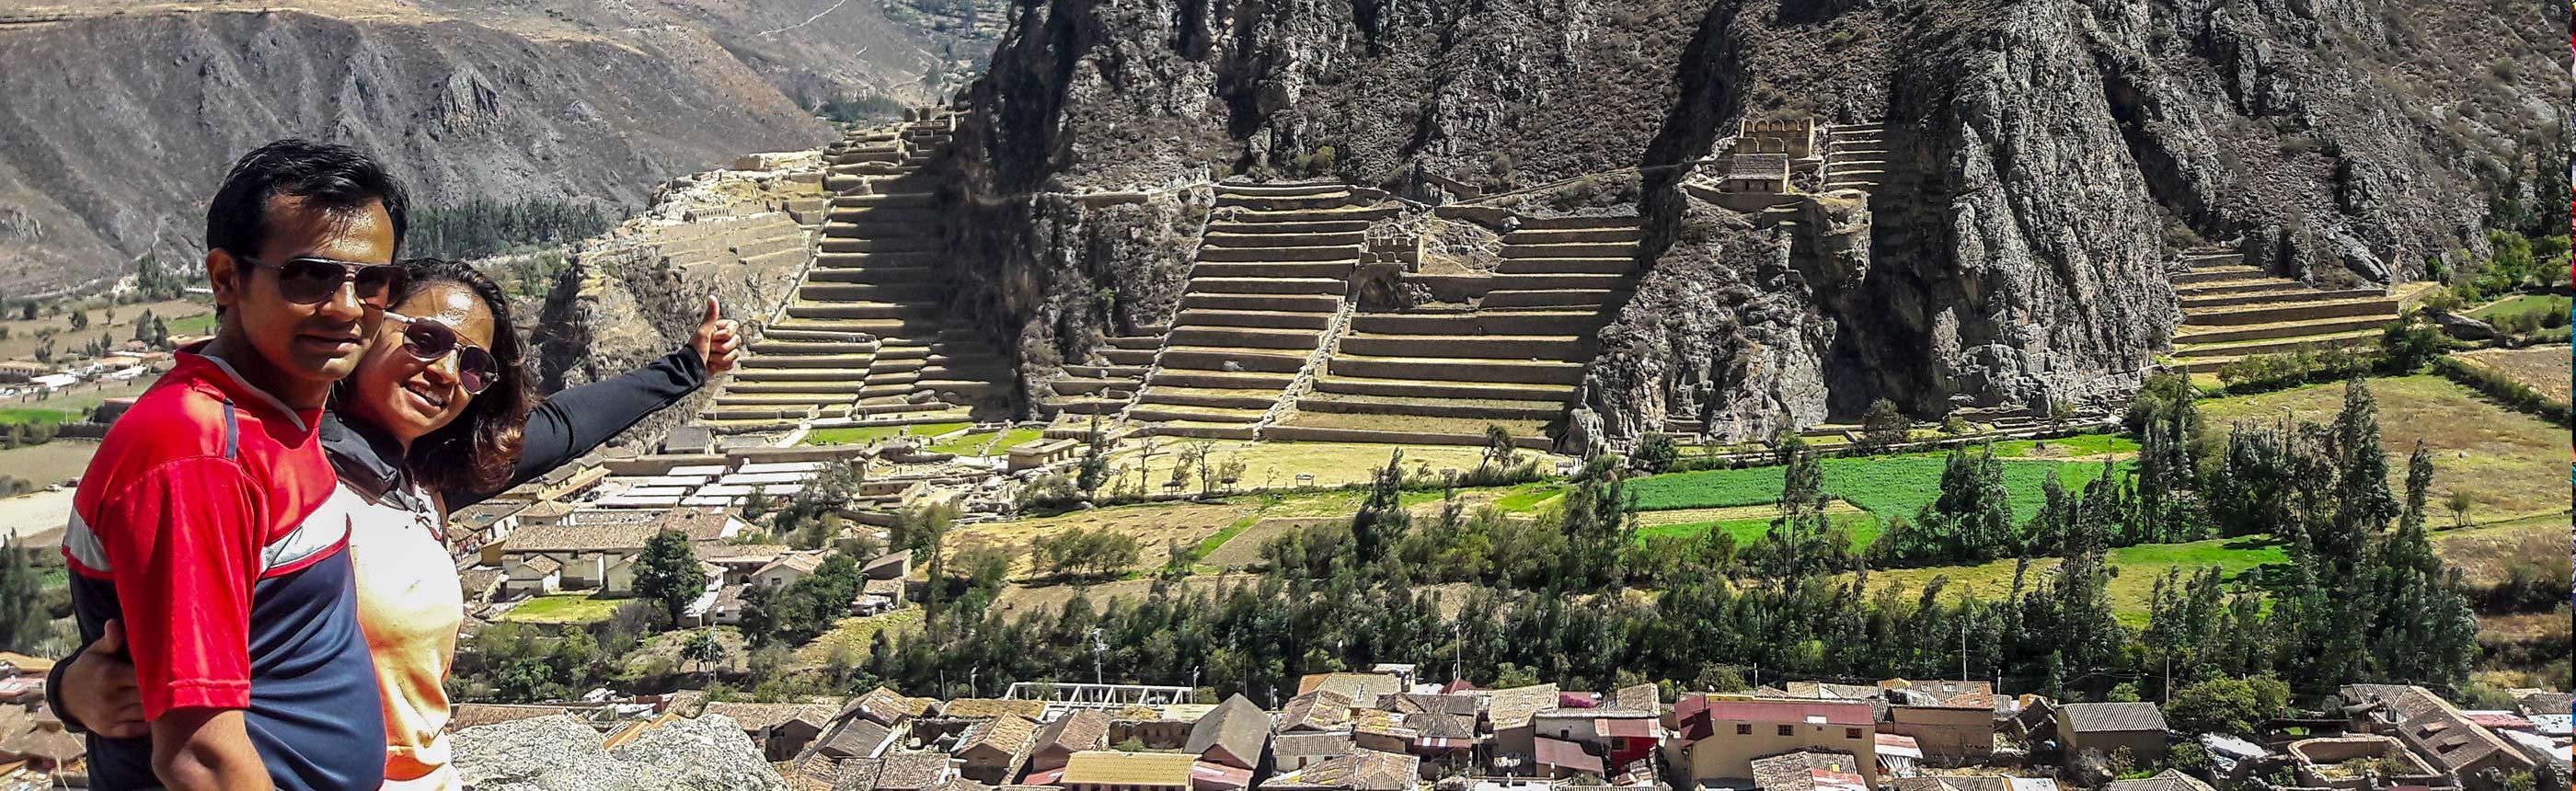 2-Day Sacred Valley & Machu Picchu